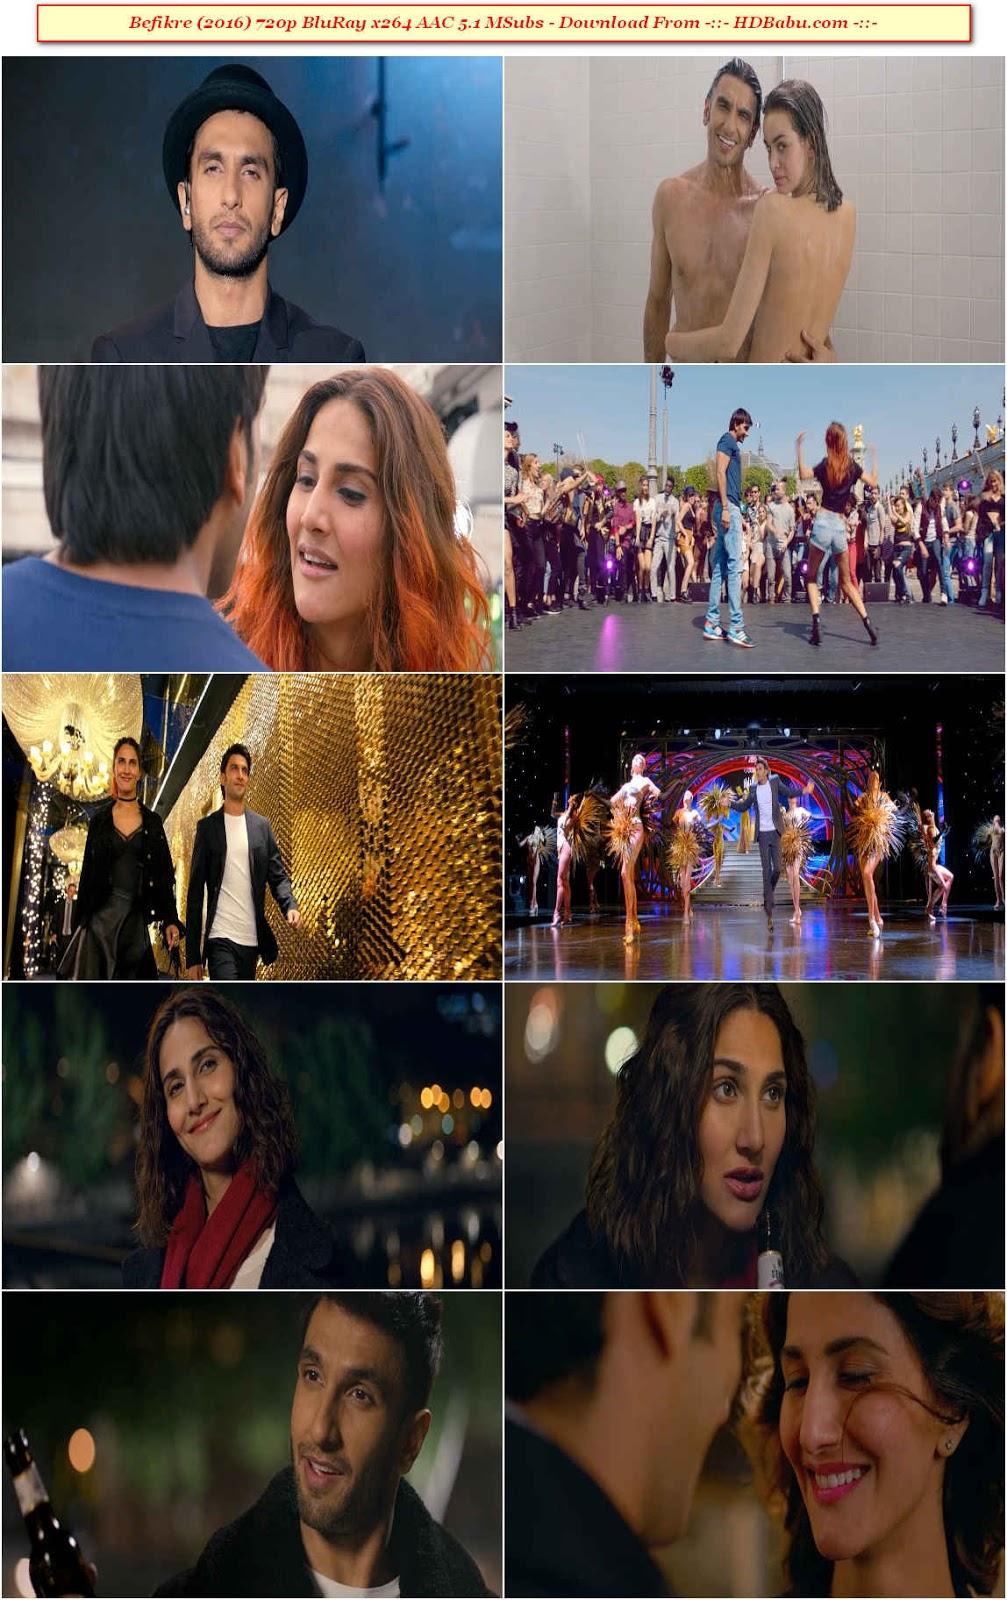 Befikre Full Movie Download, Befikre (2016) 720p BluRay x264 AAC 5.1 MSubs